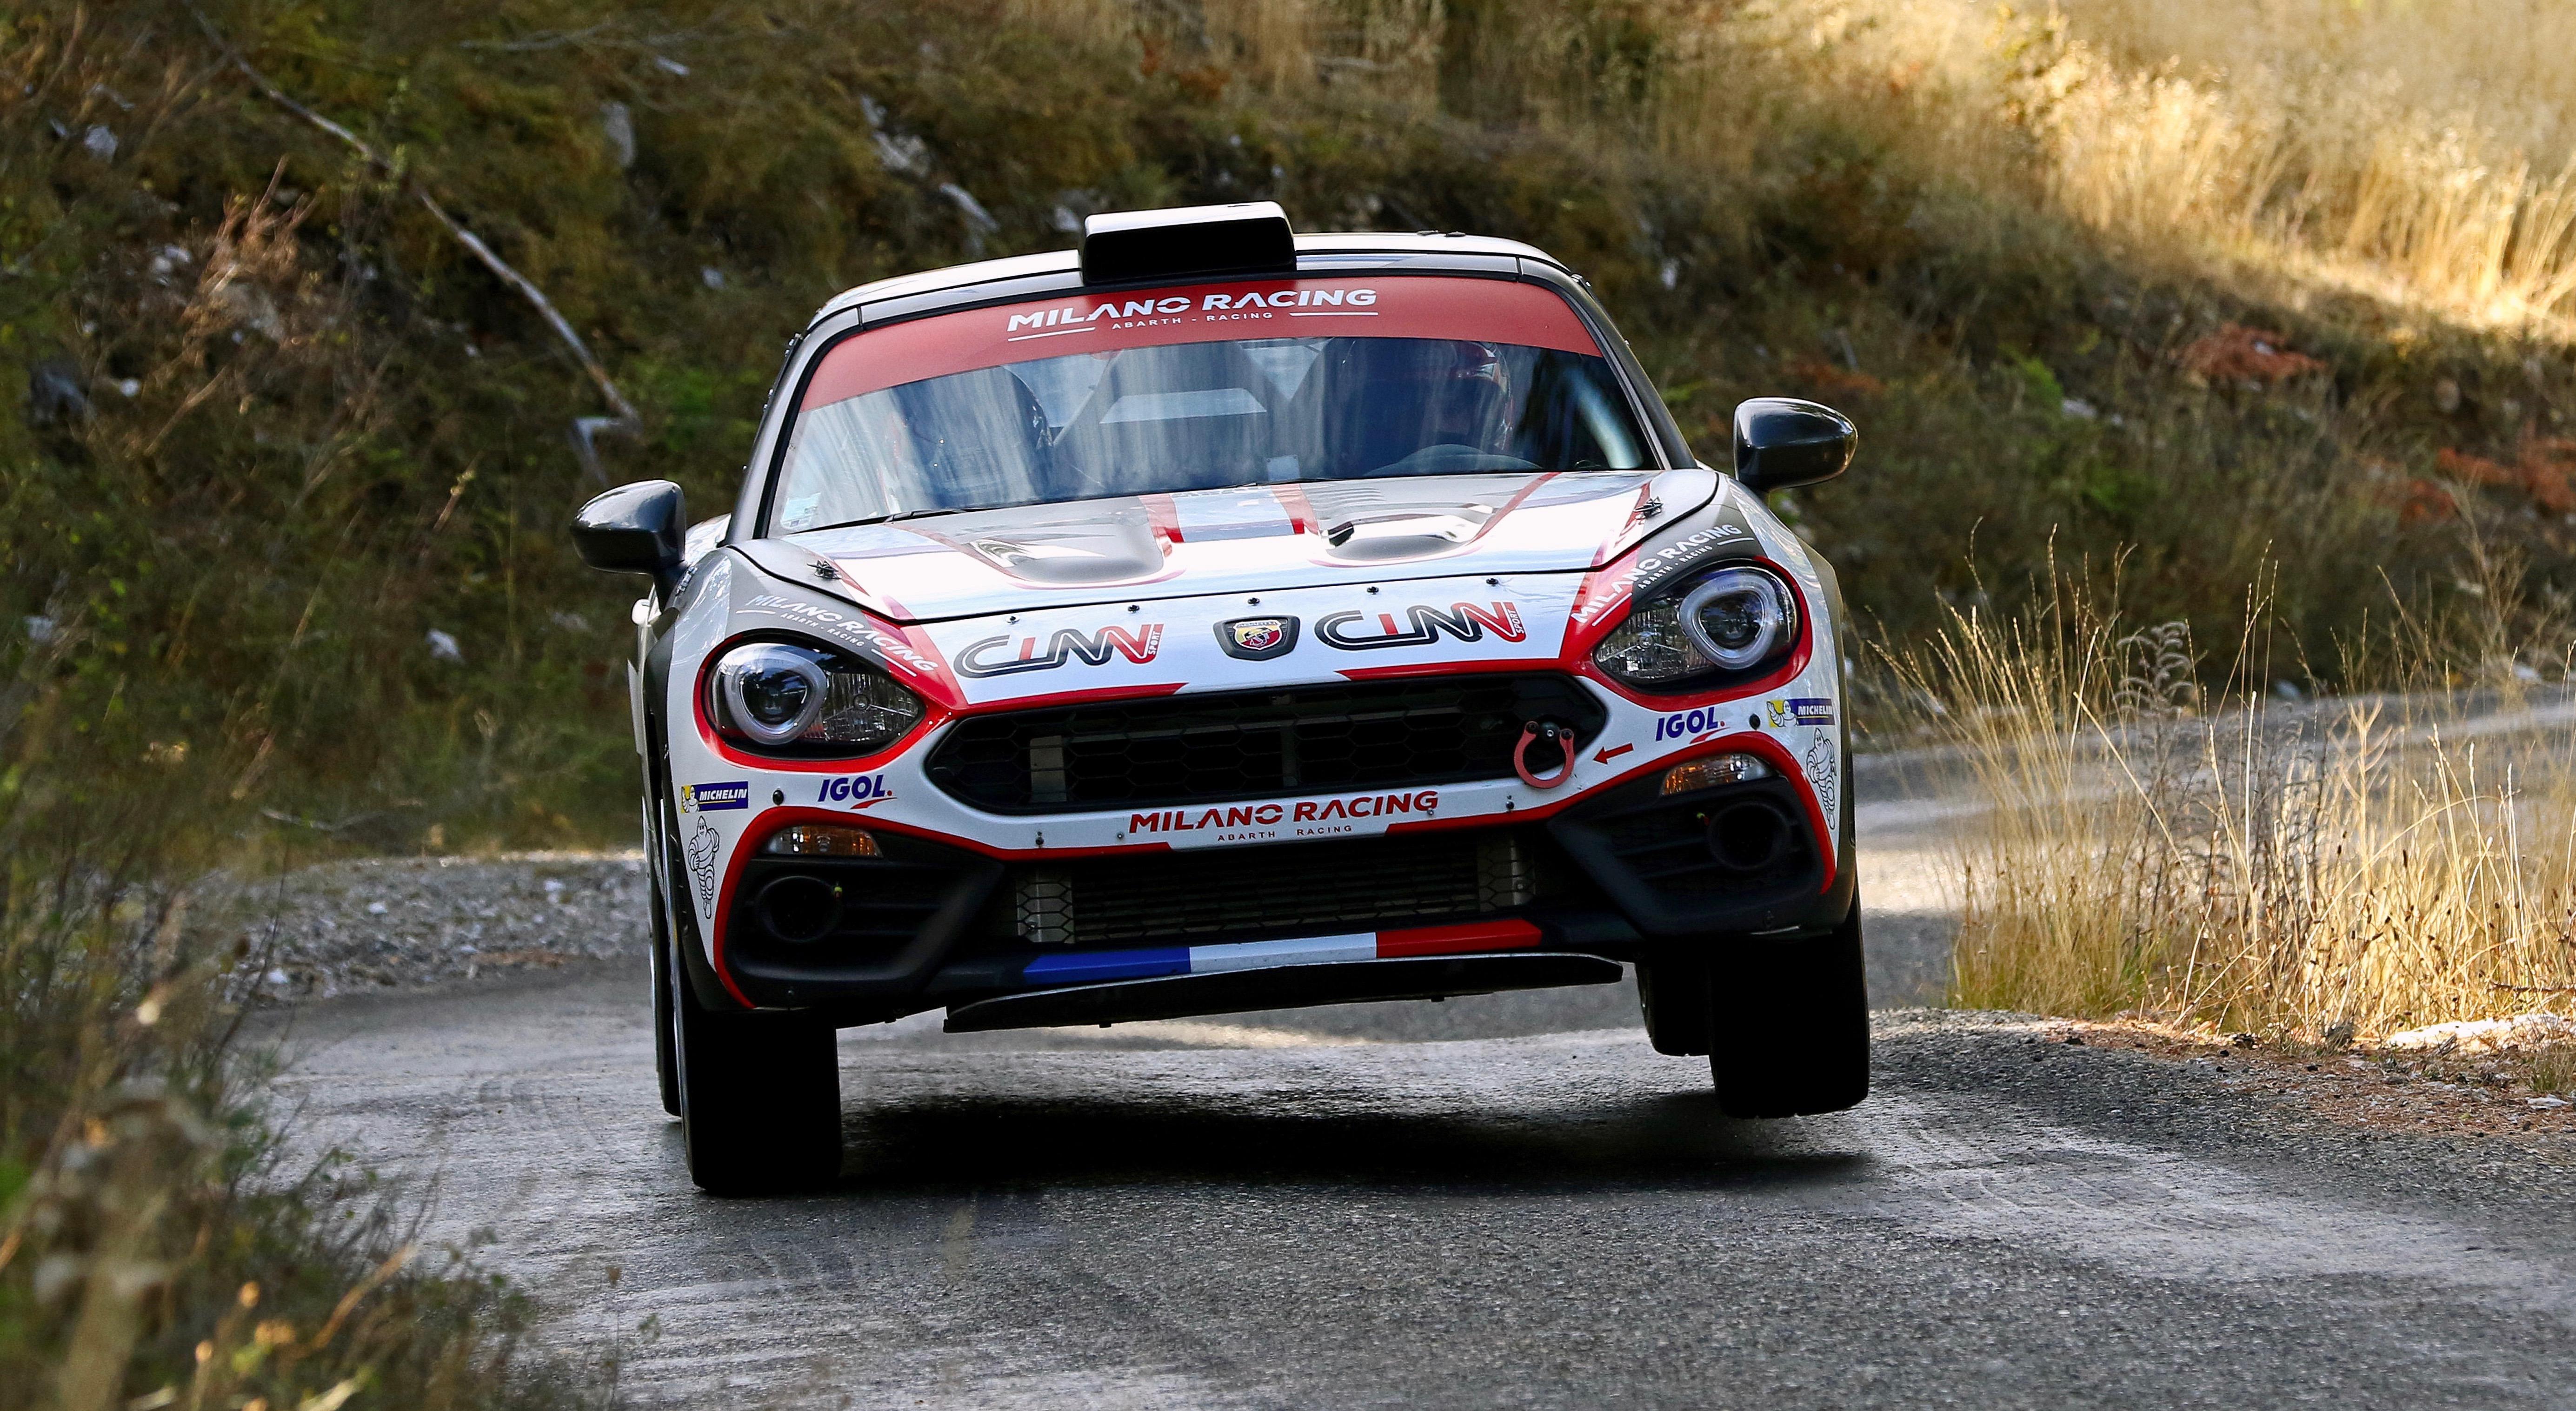 L'Abarth 124 Rally